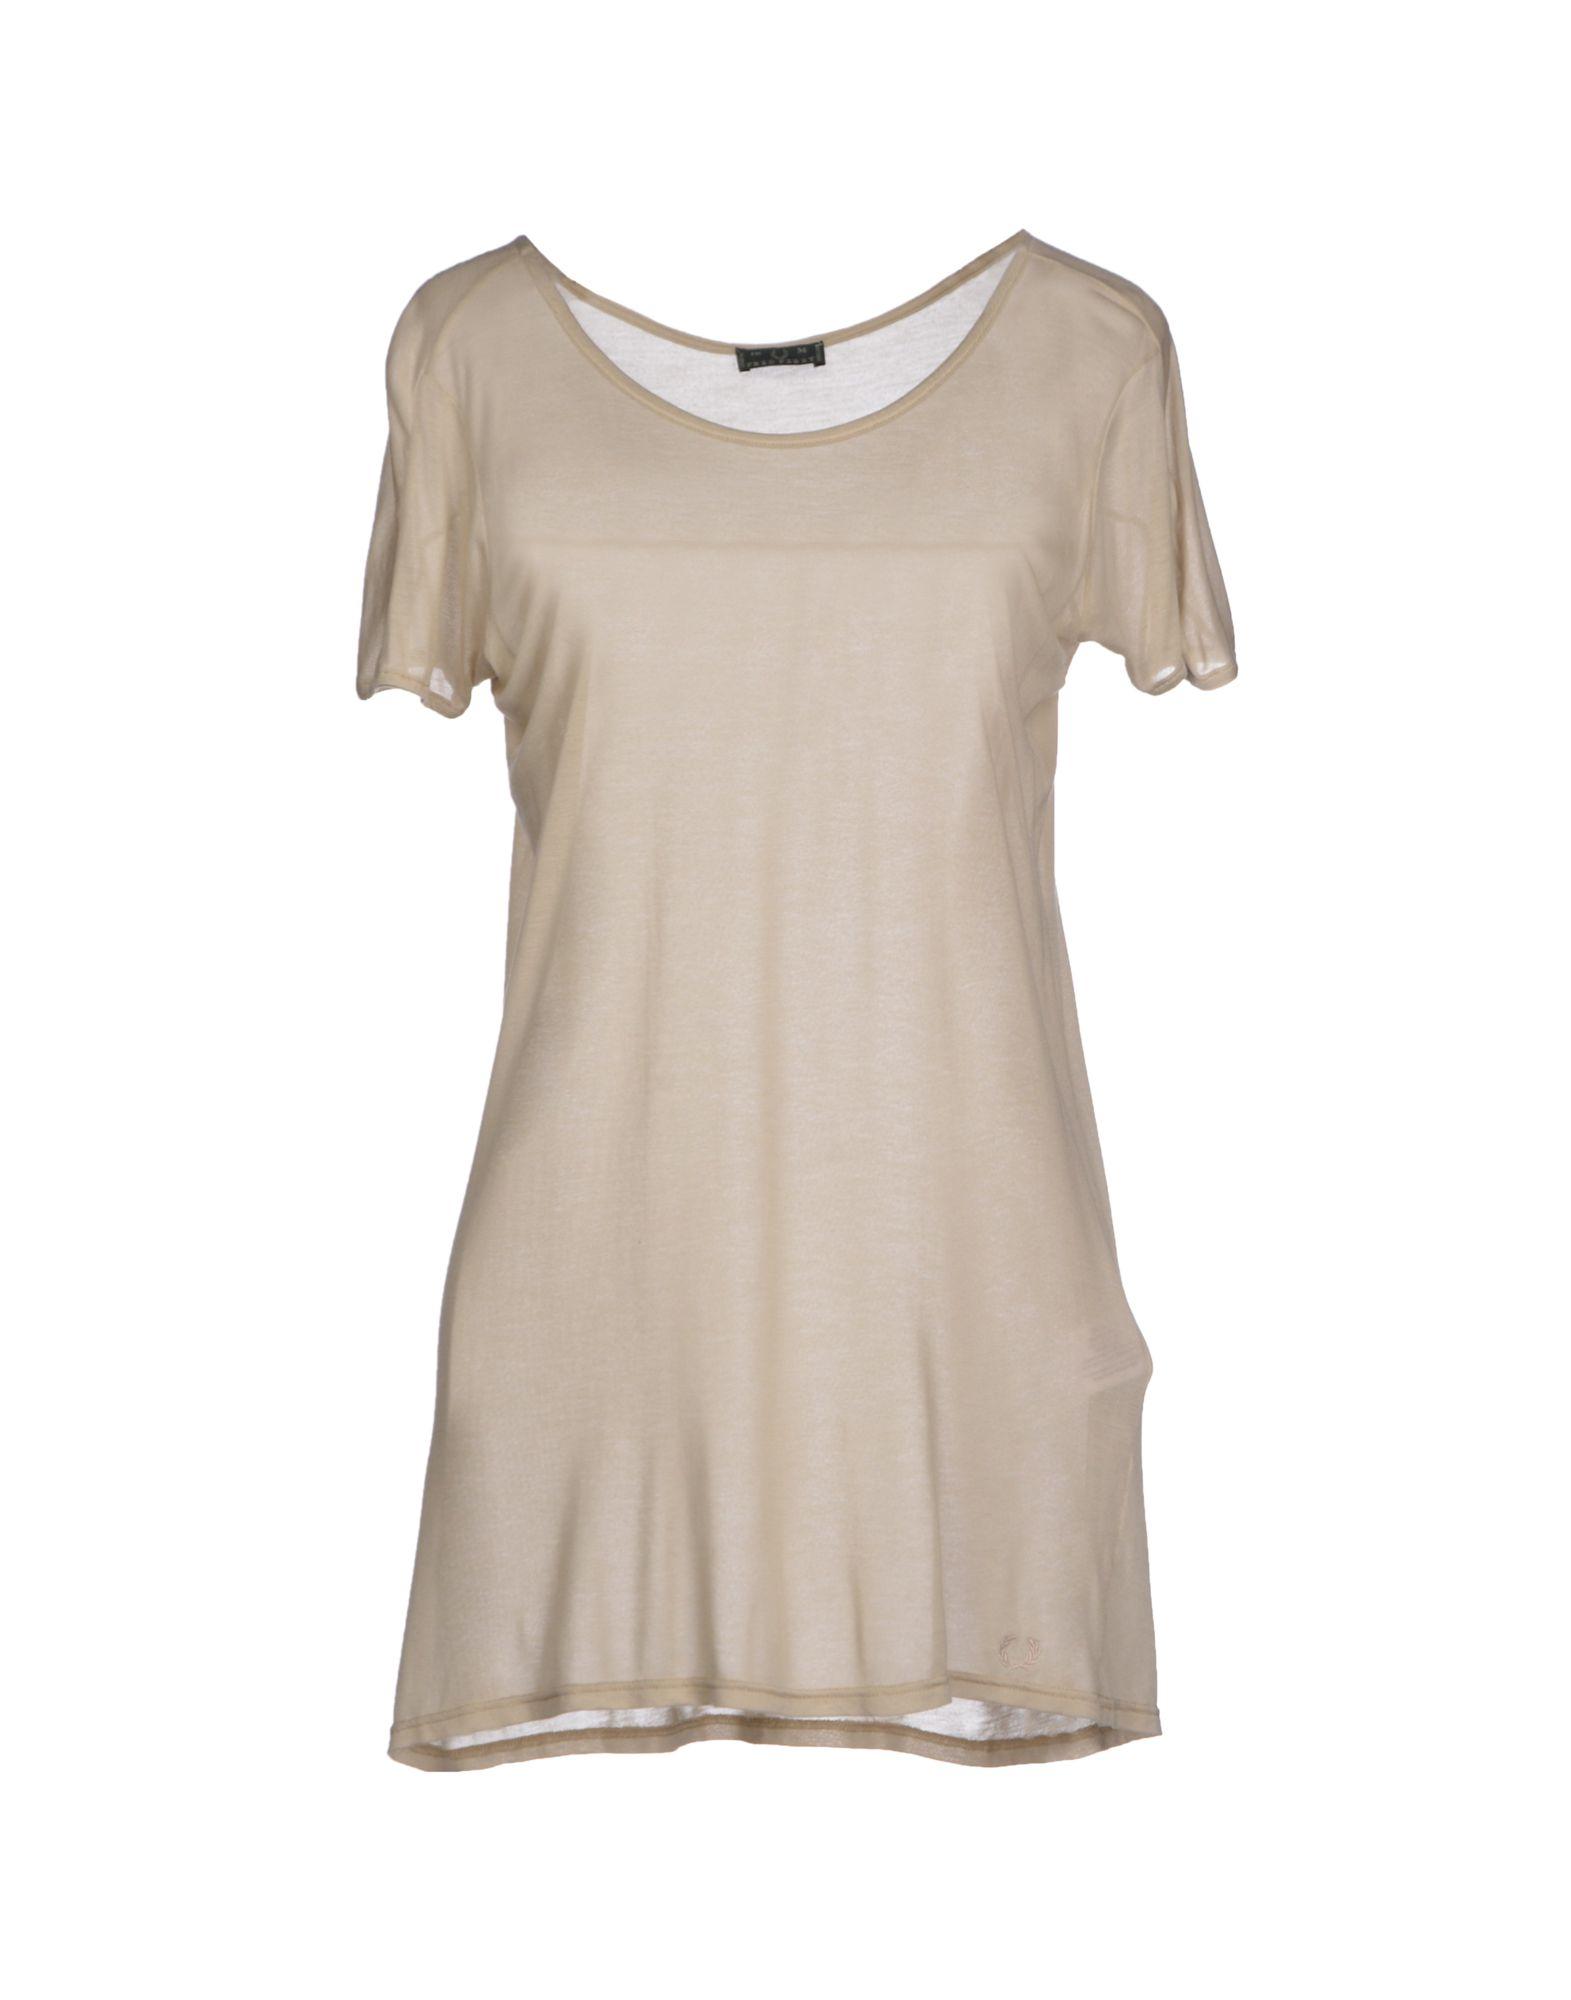 FRED PERRY Damen T-shirts Farbe Sand Größe 5